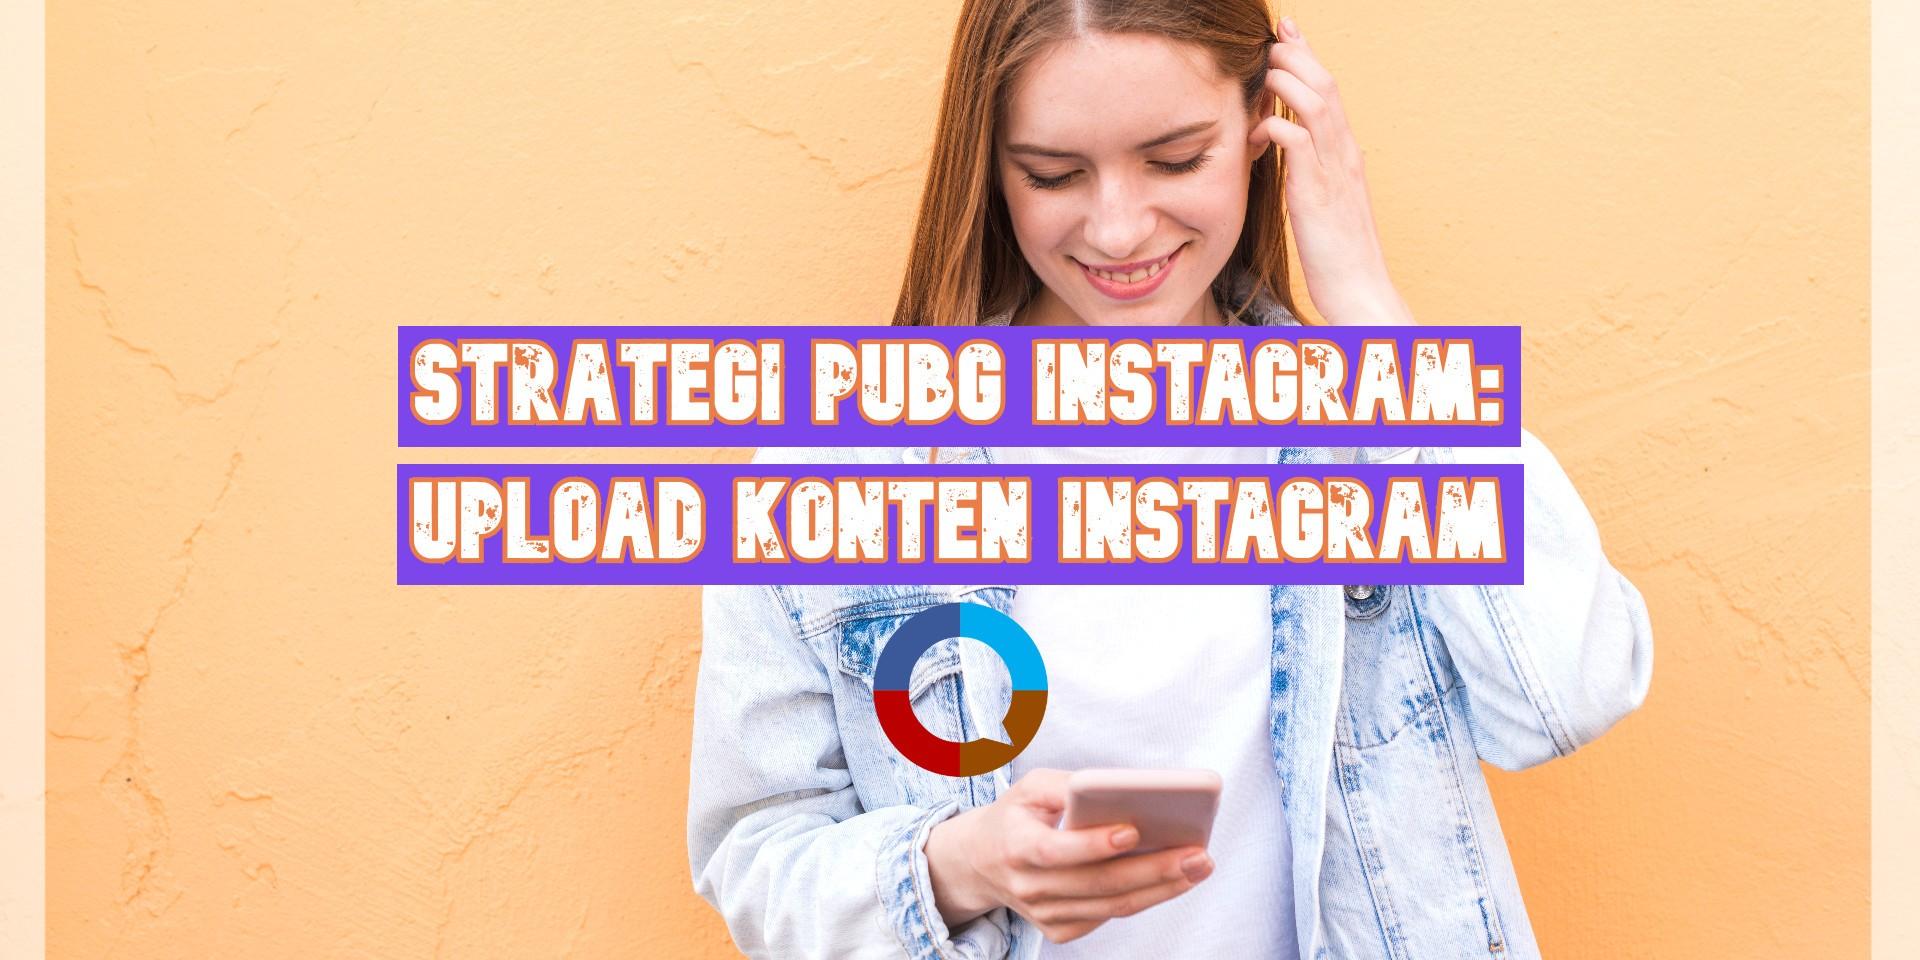 Strategi PUBG Instagram: Upload Konten Instagram